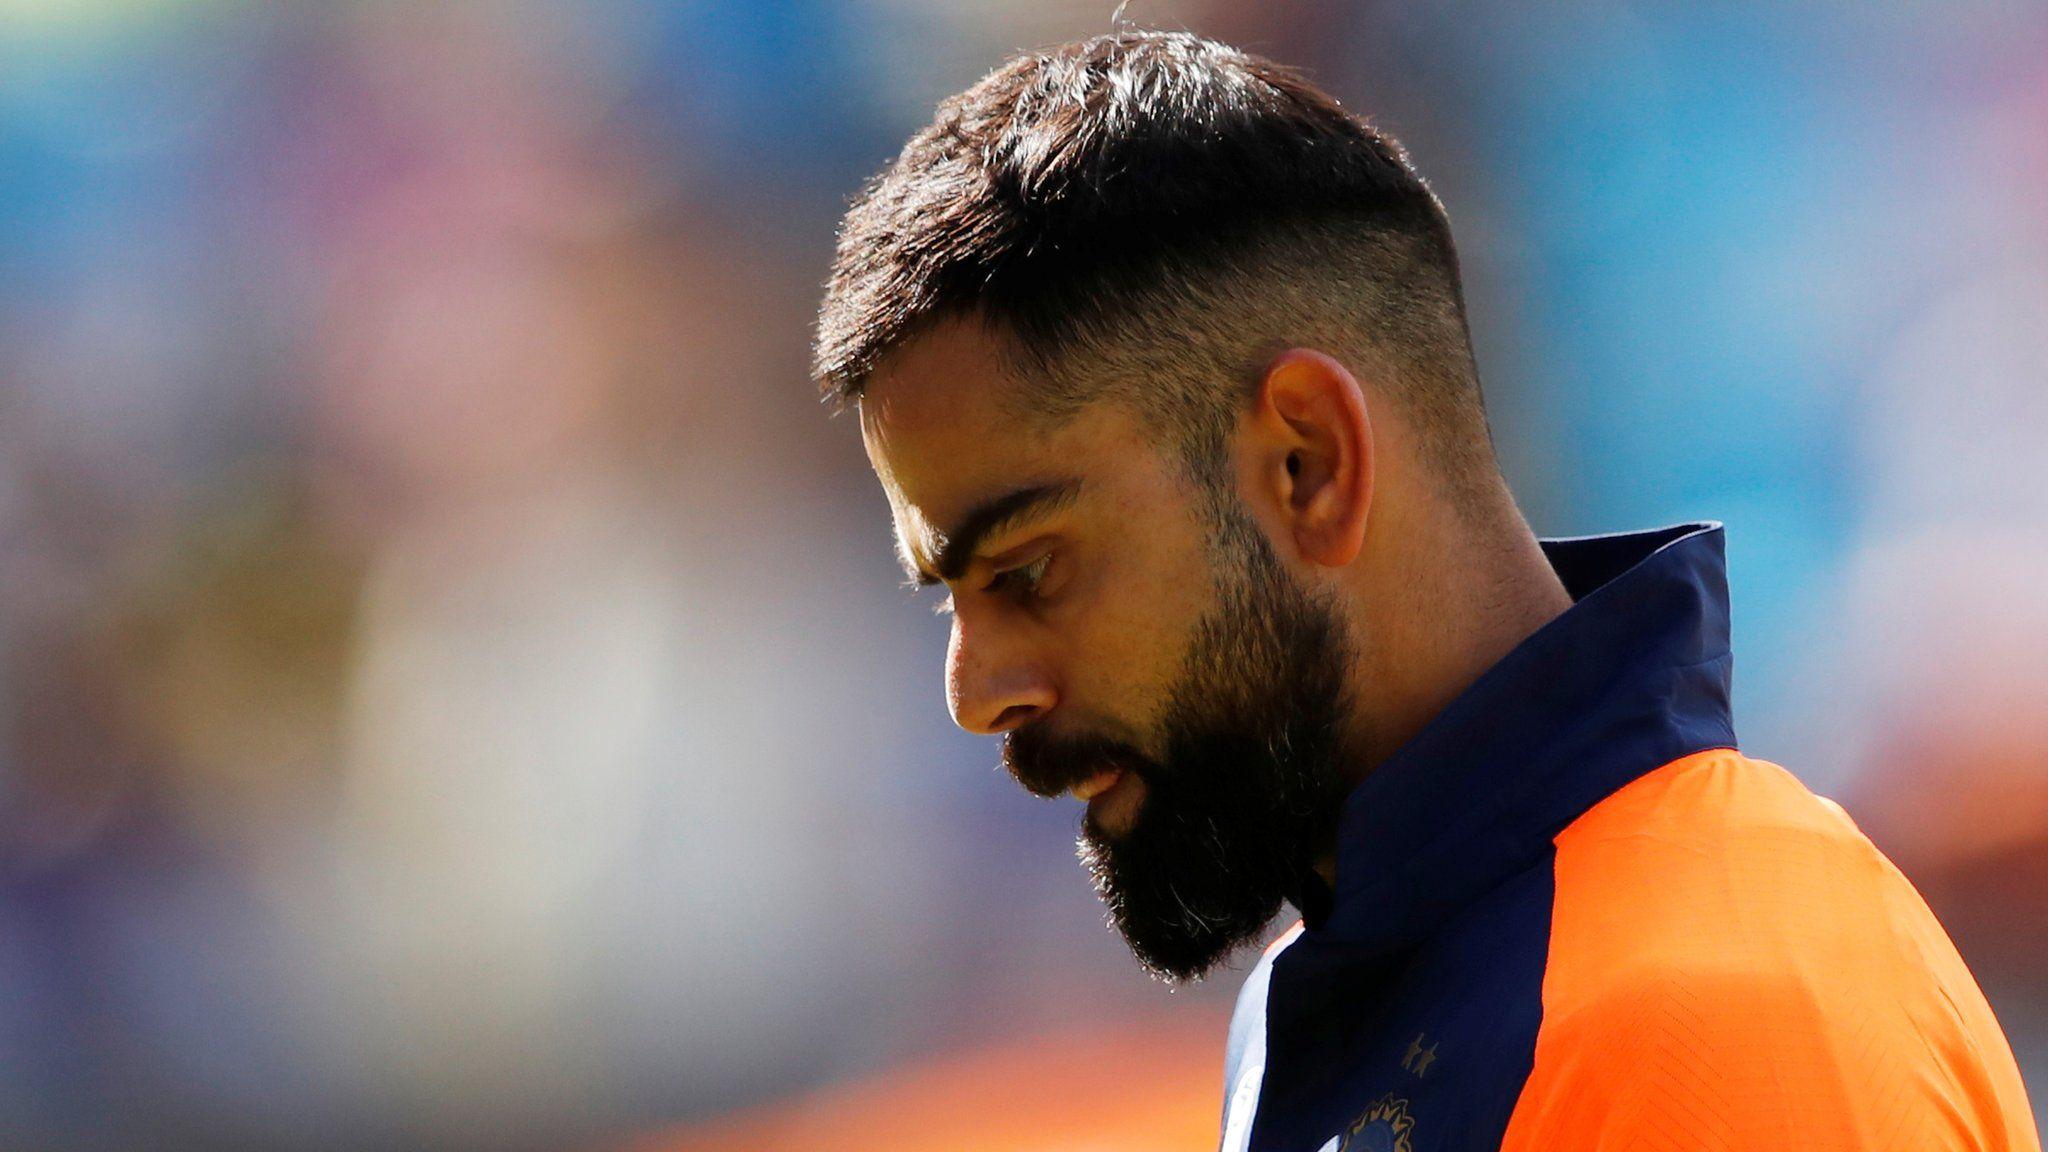 Cricket World Cup Virat Kohli Questions Crazy Short Boundary